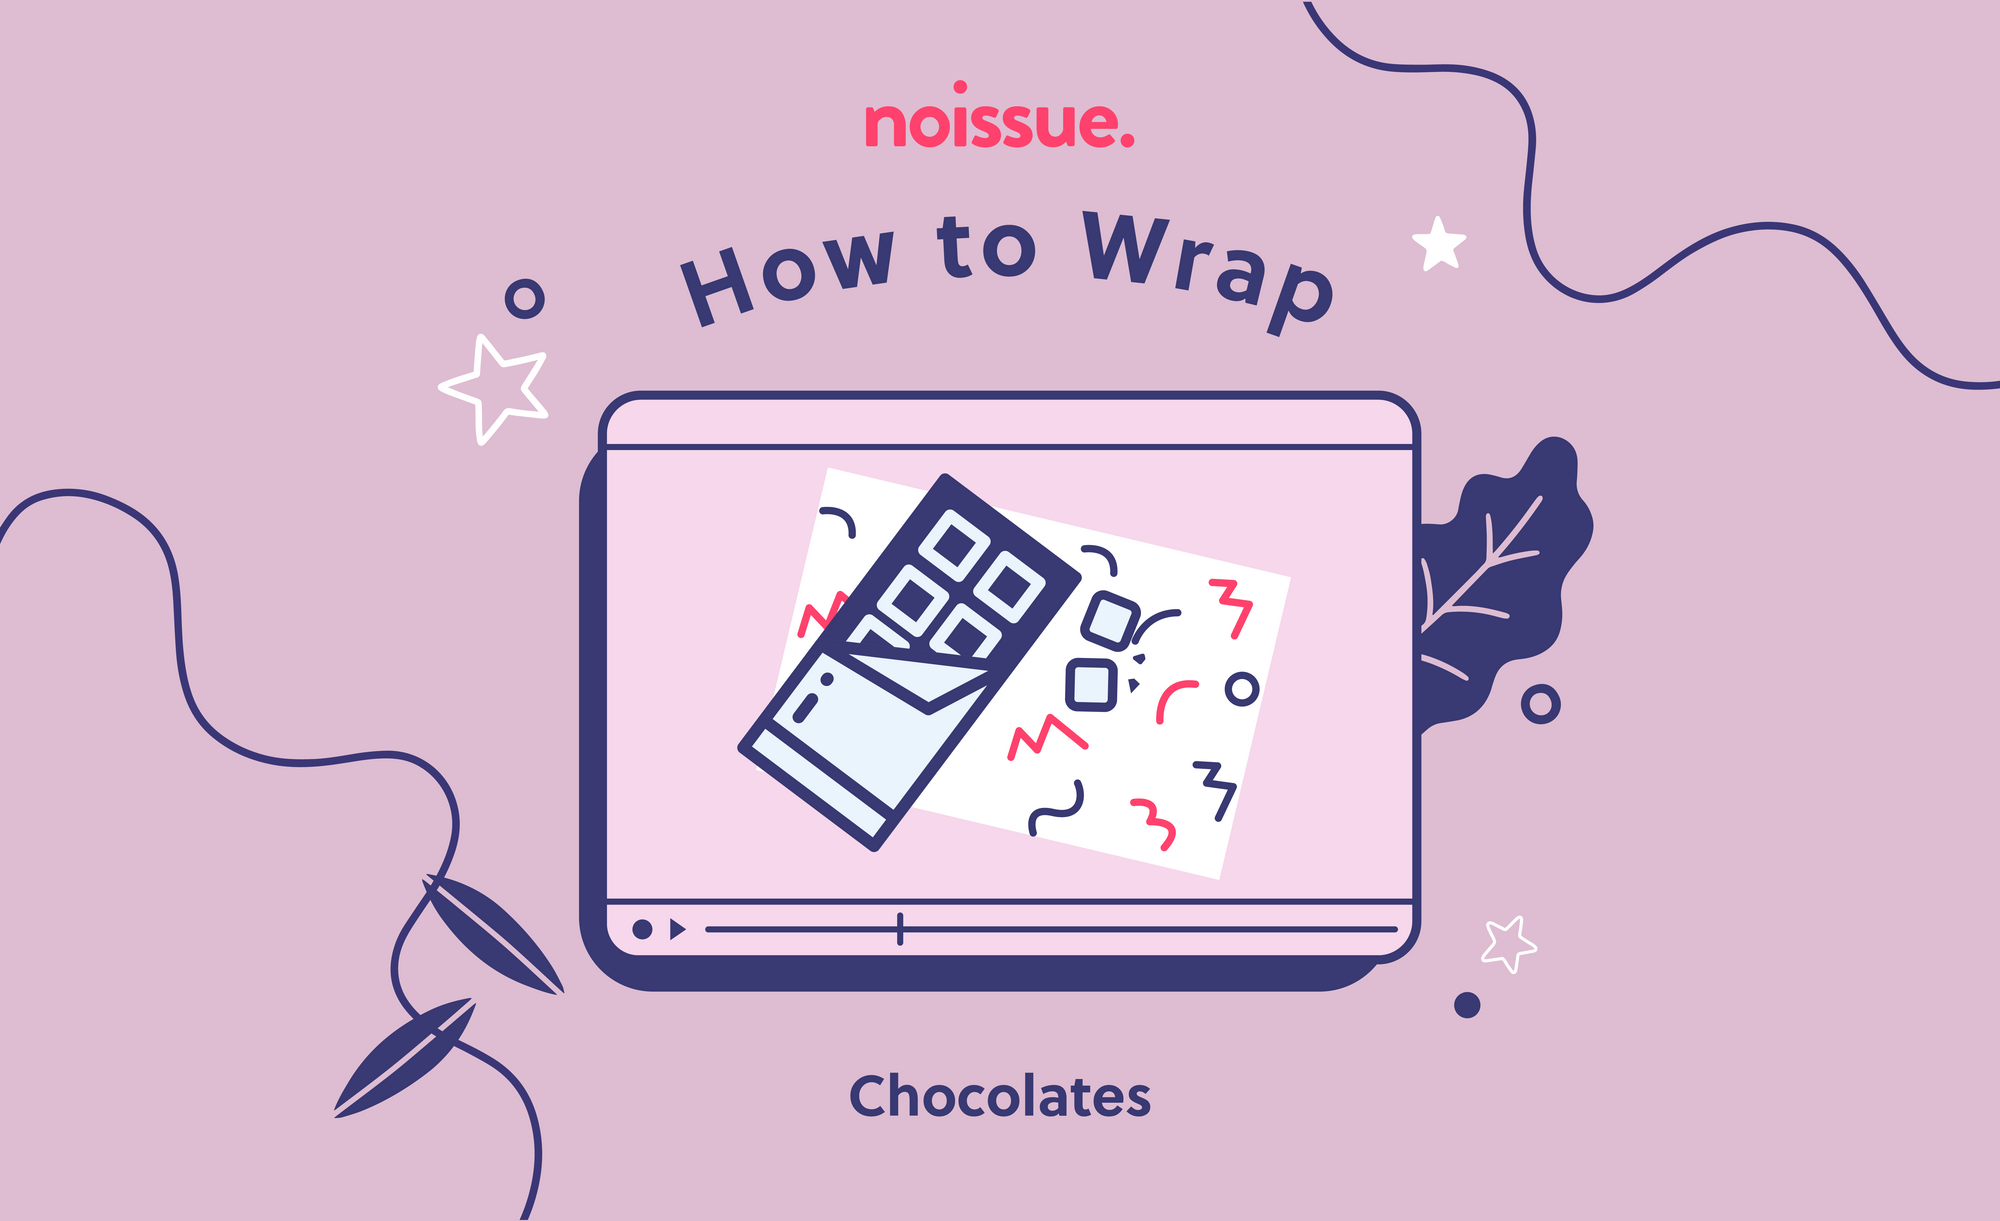 How to Wrap: Chocolates